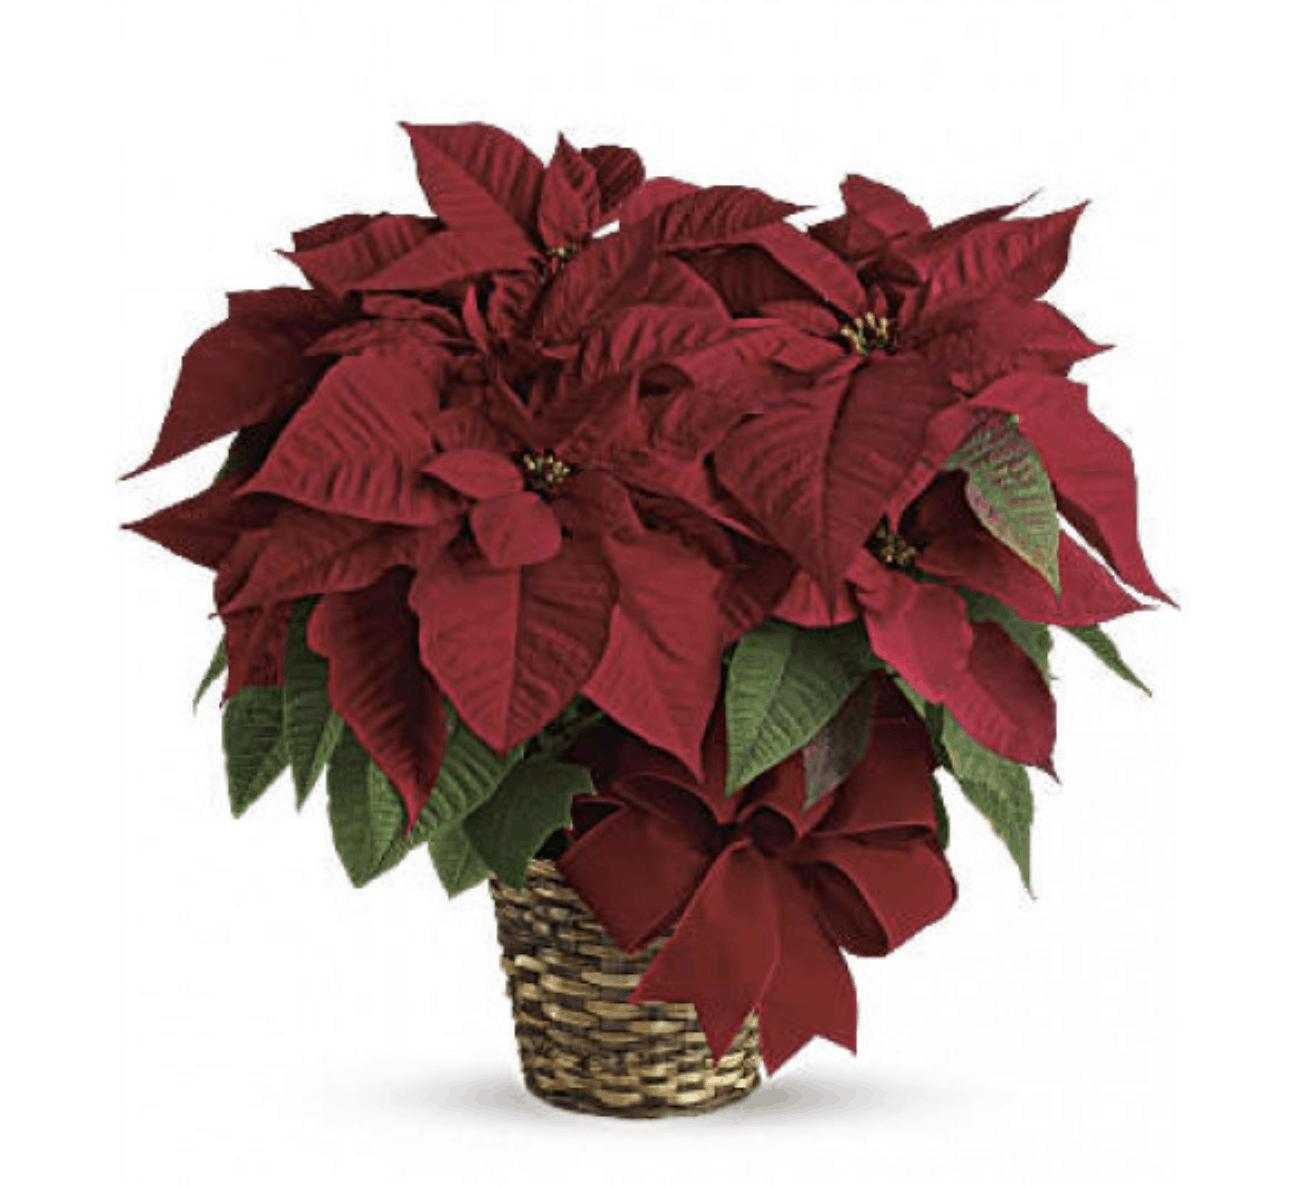 Celebrating Poinsettia Day on December 12th